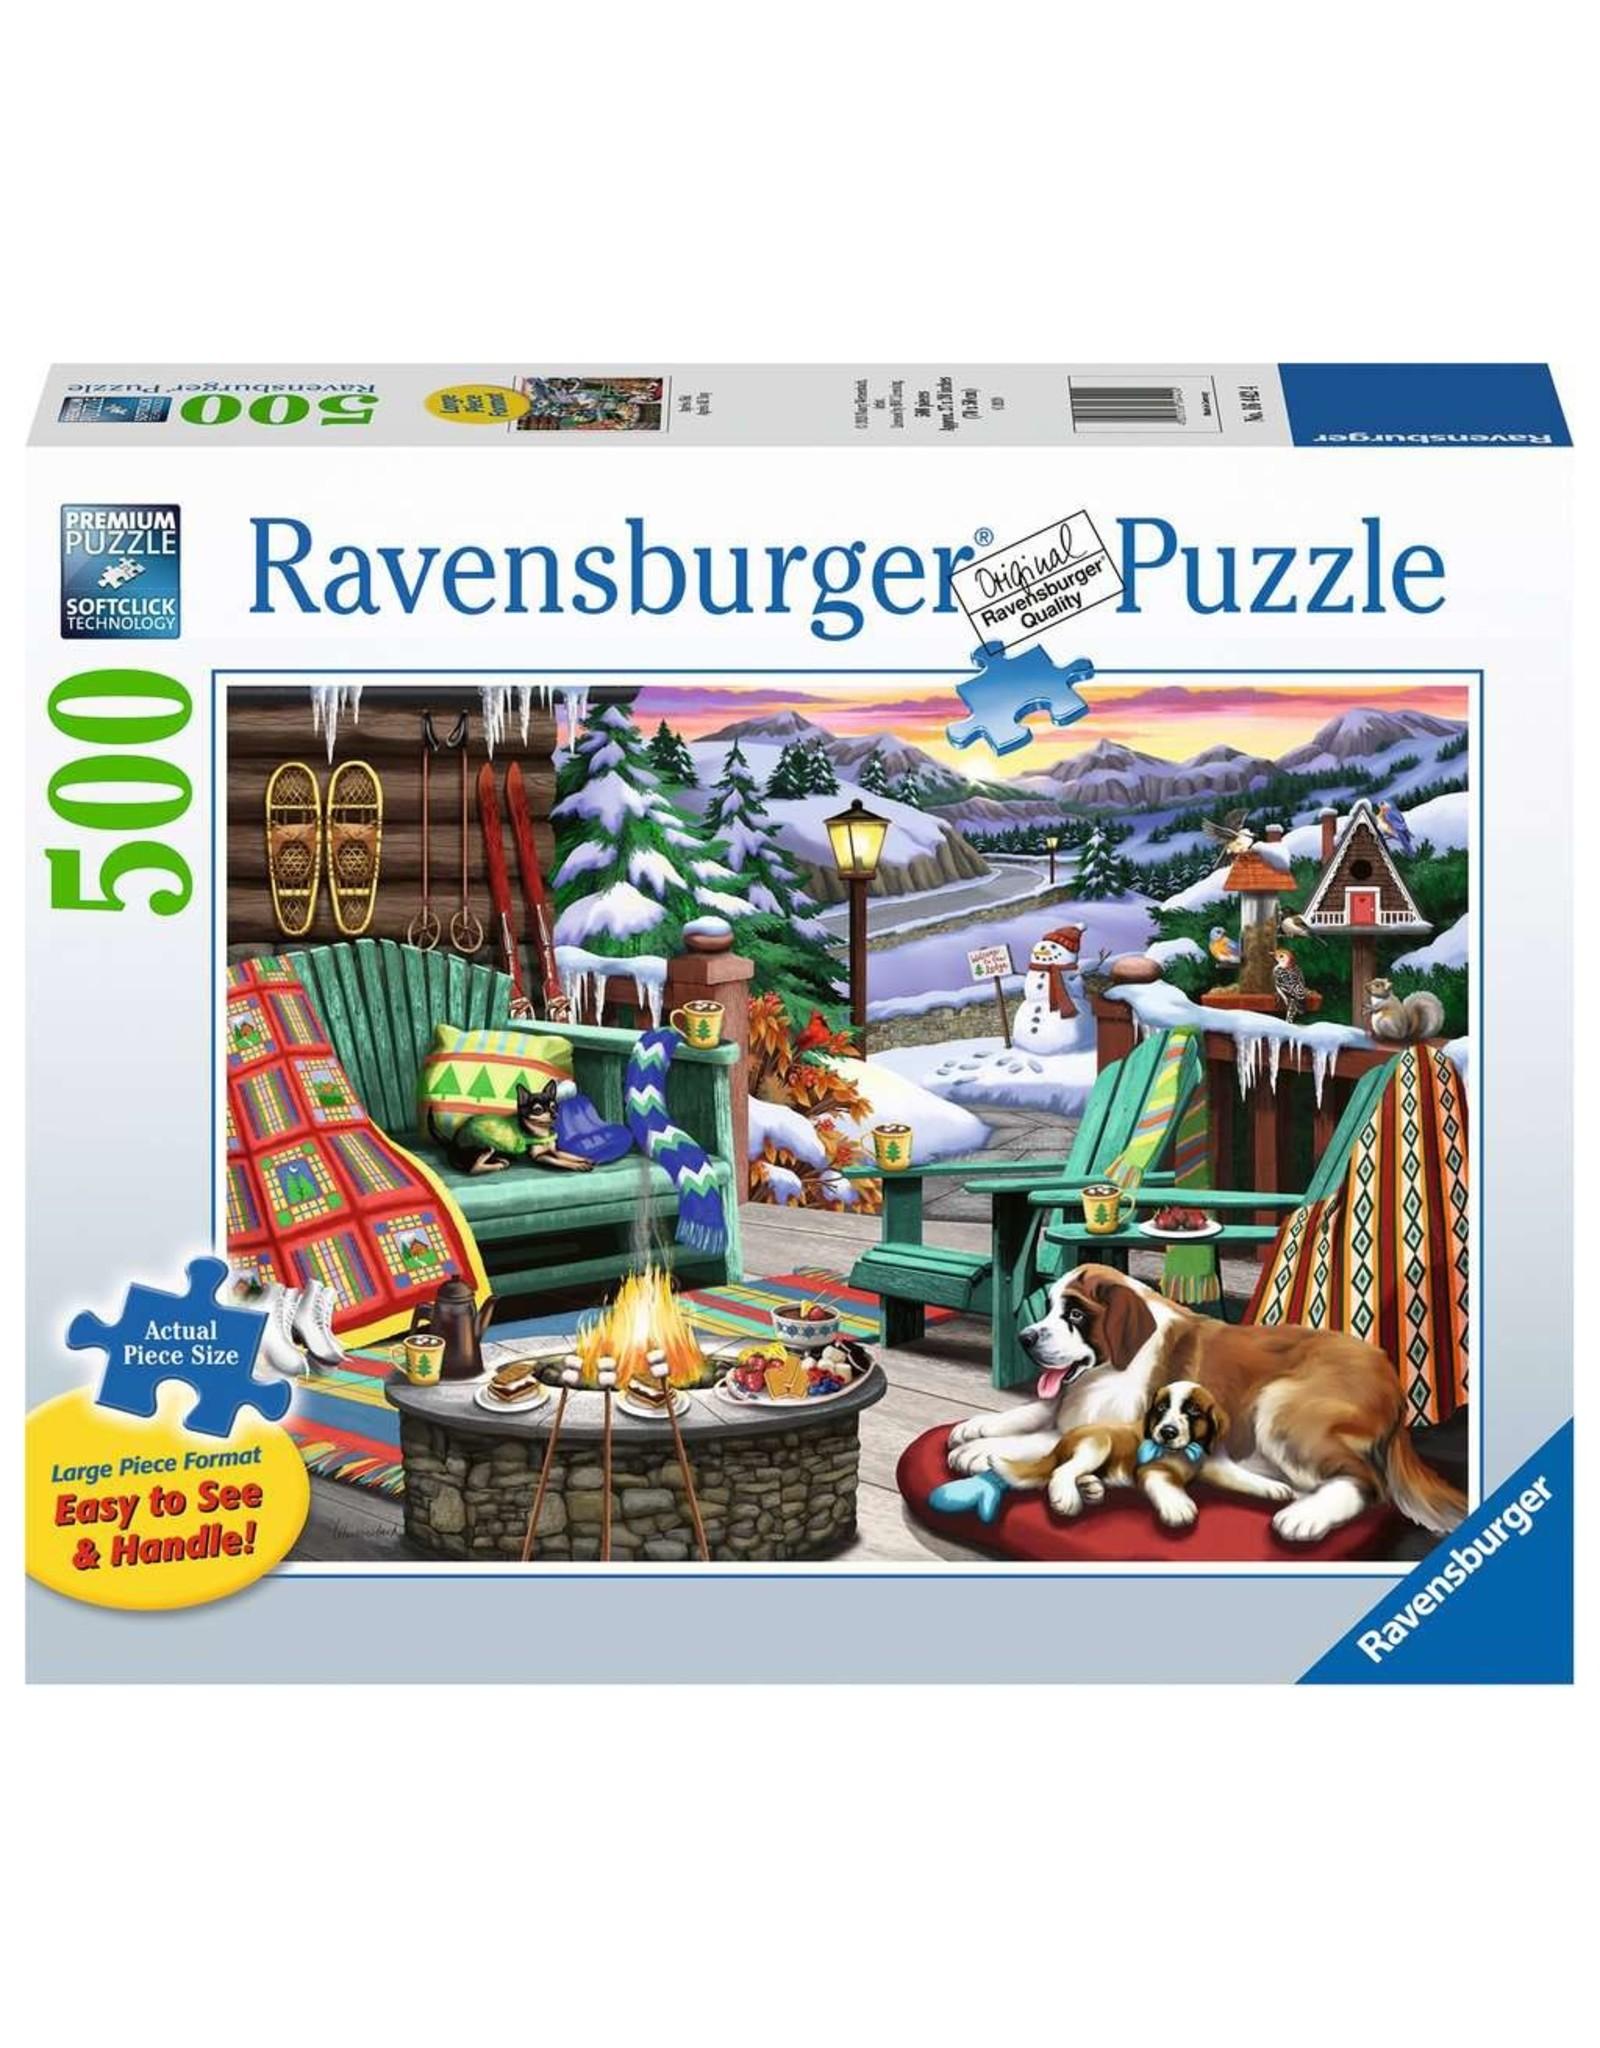 Ravensburger Apres All Day 500pc